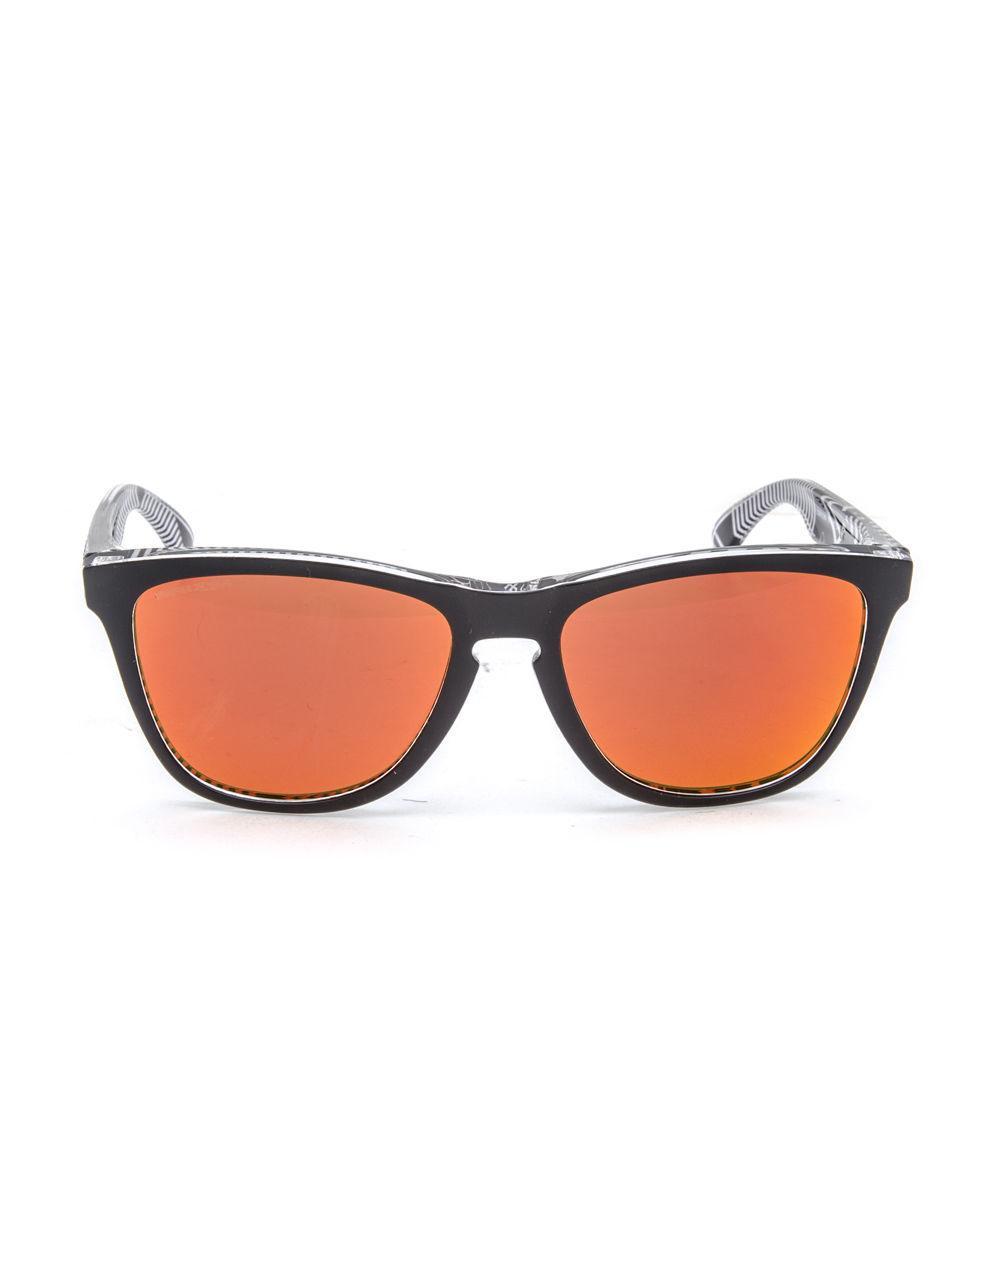 5defd89738 Lyst - Oakley Frogskins Urban Commuter Tokyo Black   Prizm Ruby Sunglasses  for Men